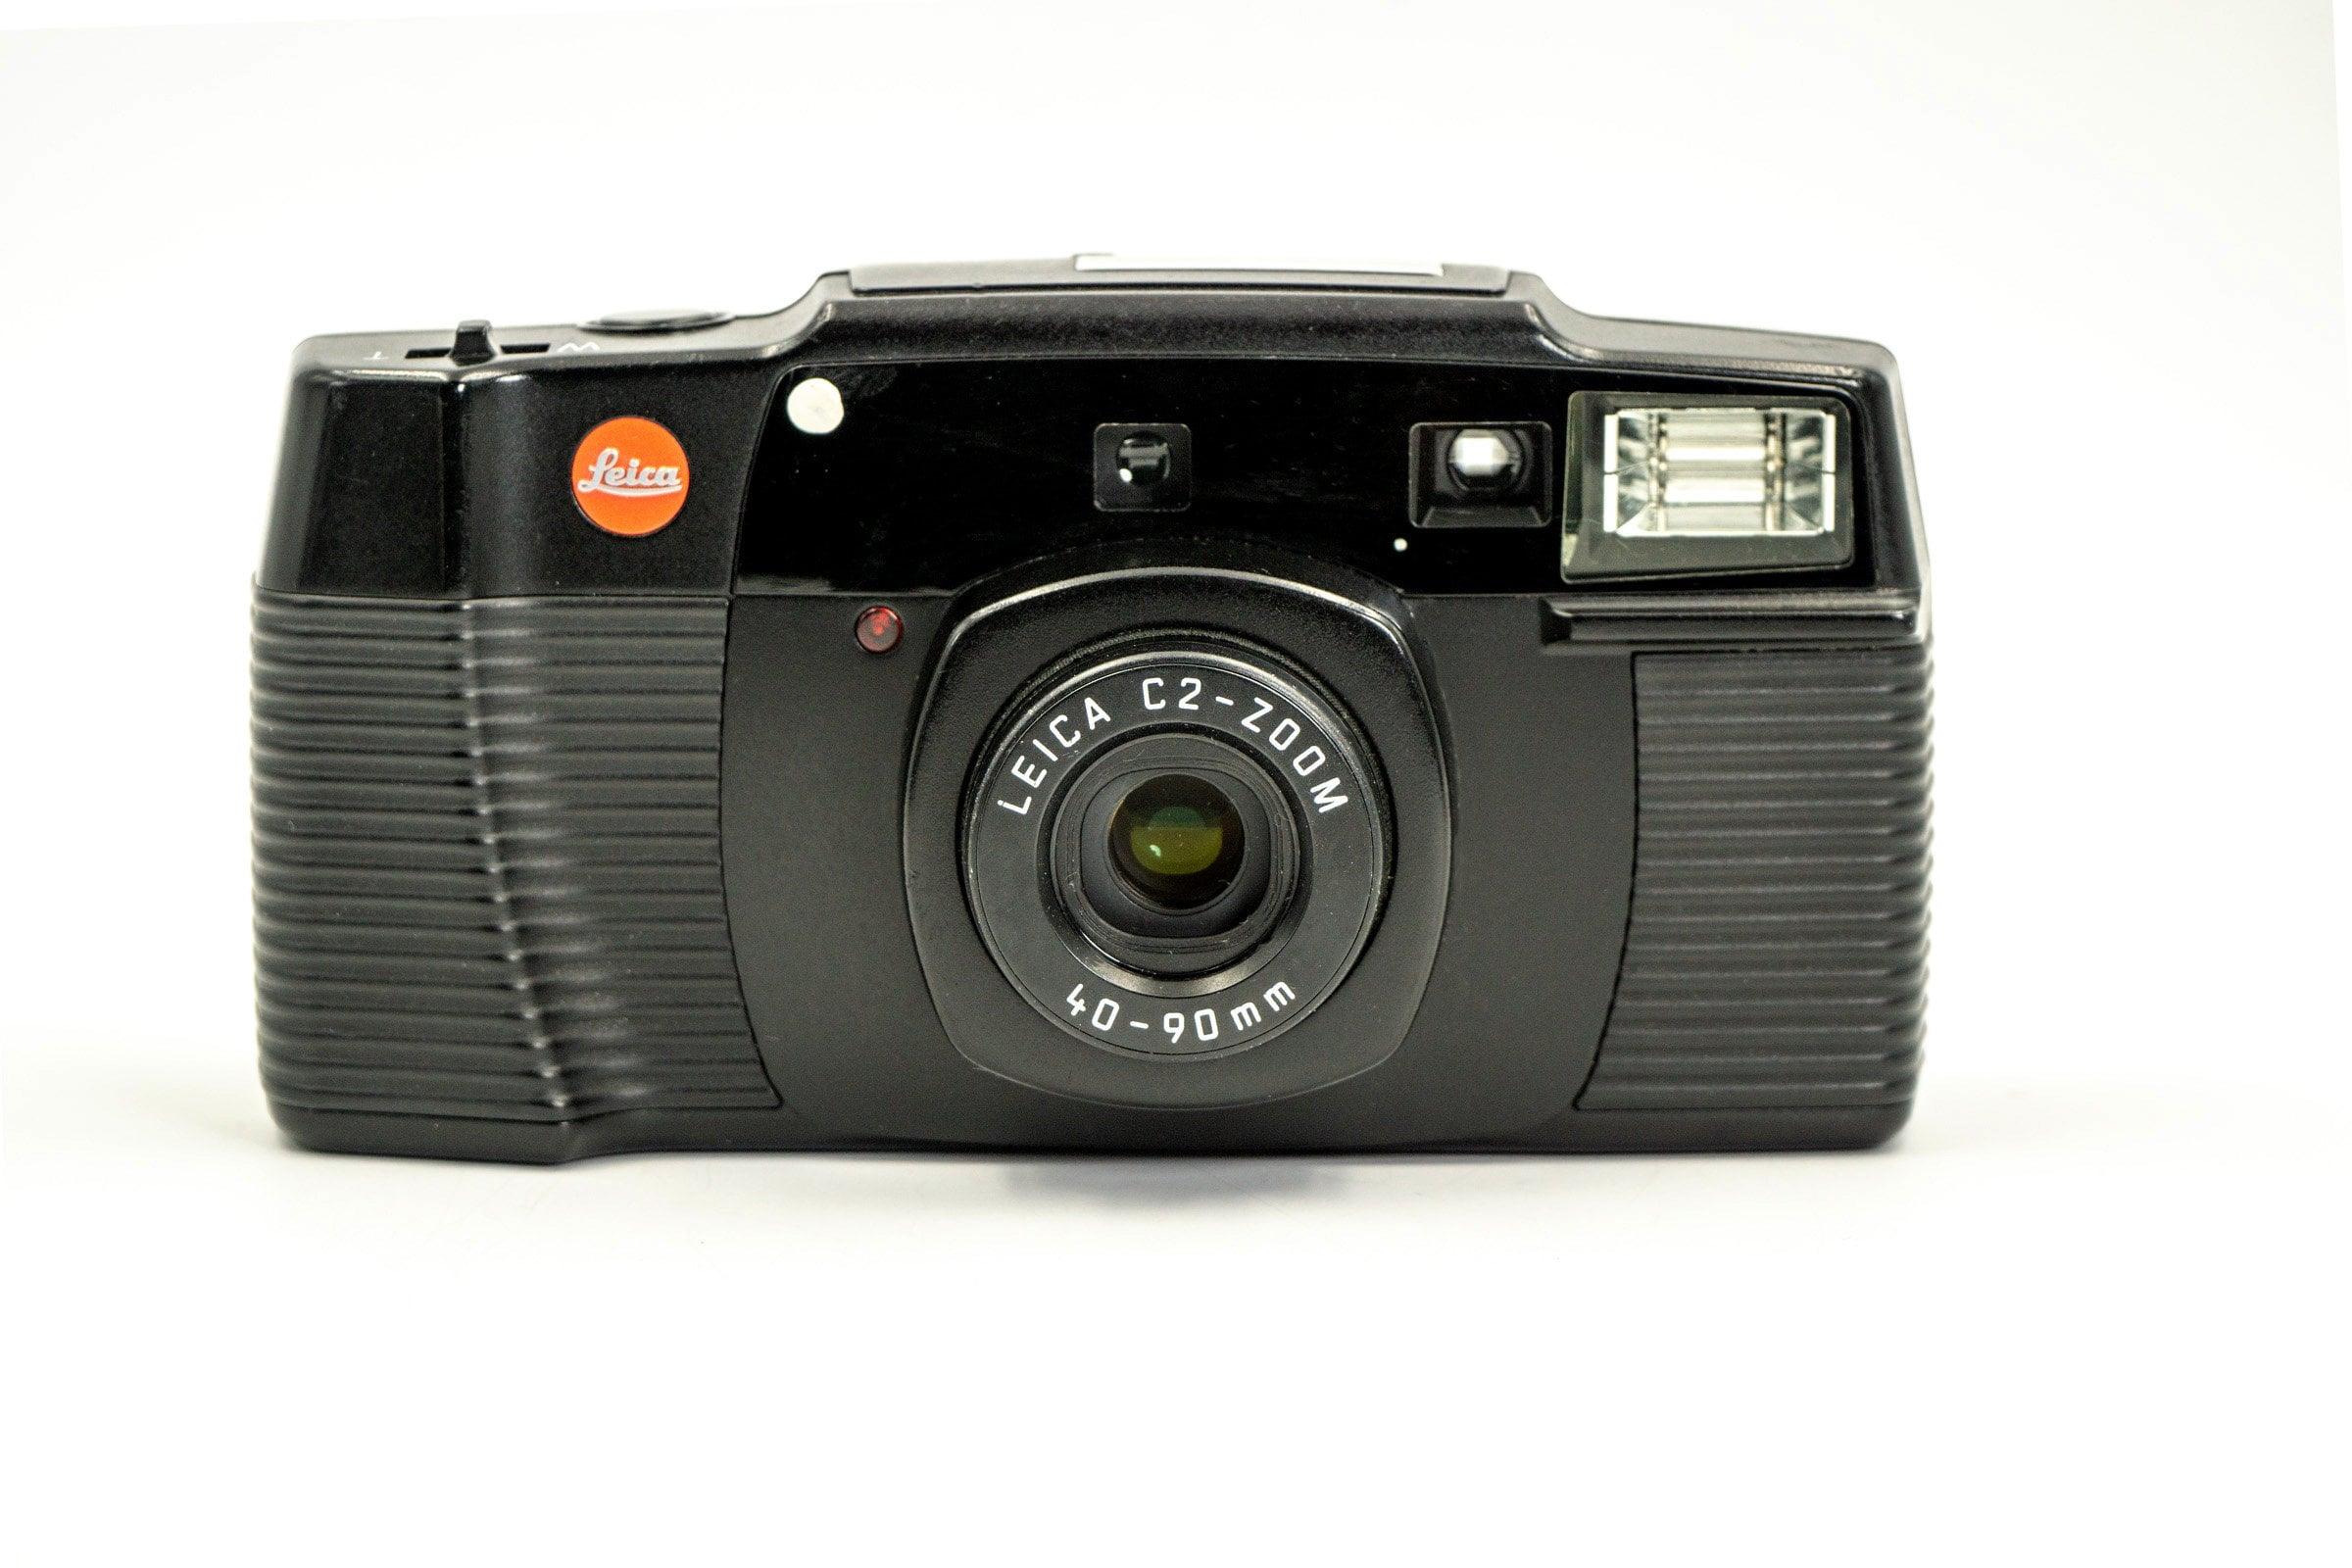 Leica 35mm Film Rangefinder C2 Zoom - Great High End